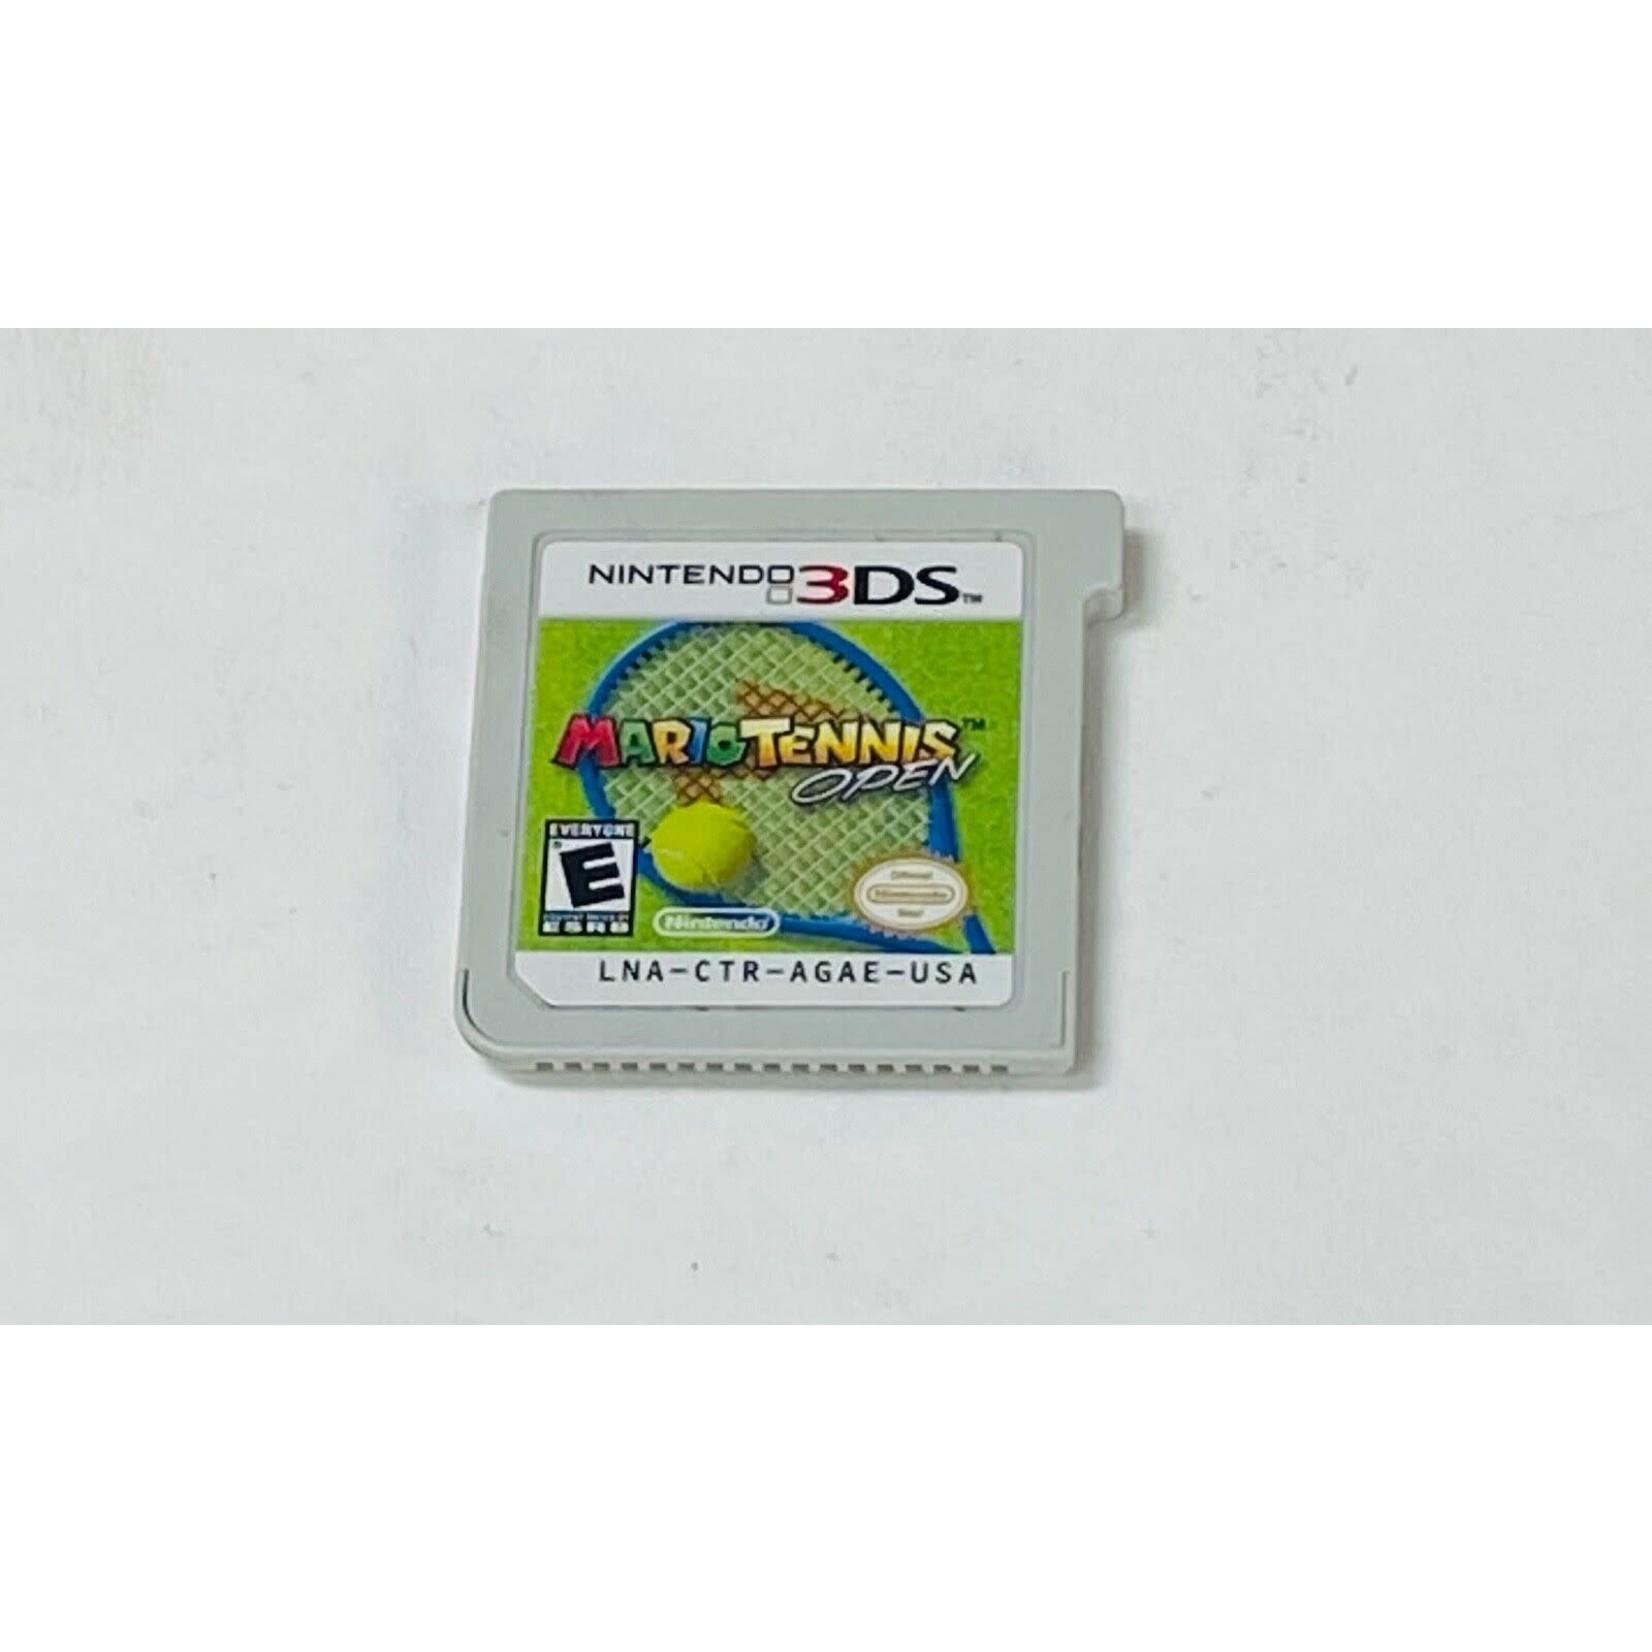 3DSU-Mario Tennis Open (Chip Only)